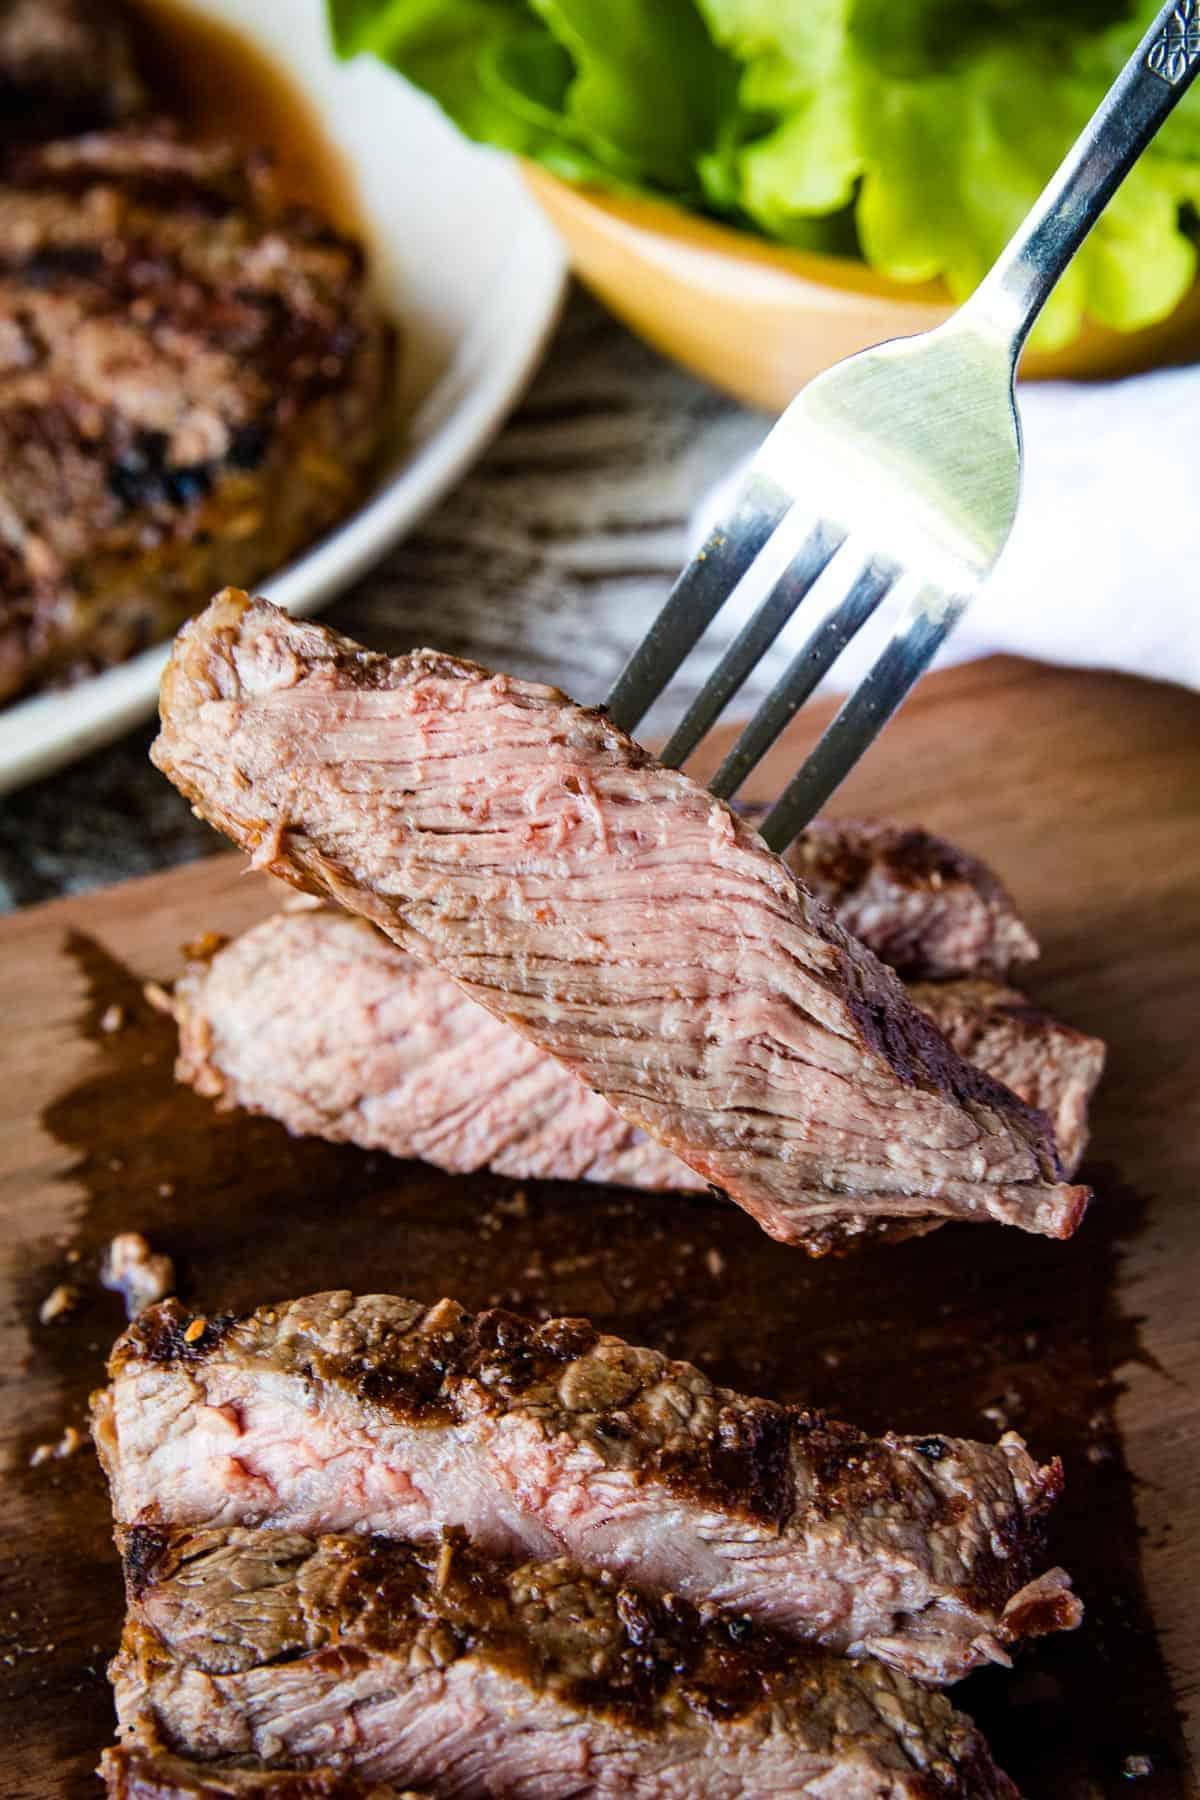 Fork holding piece of ribeye steak